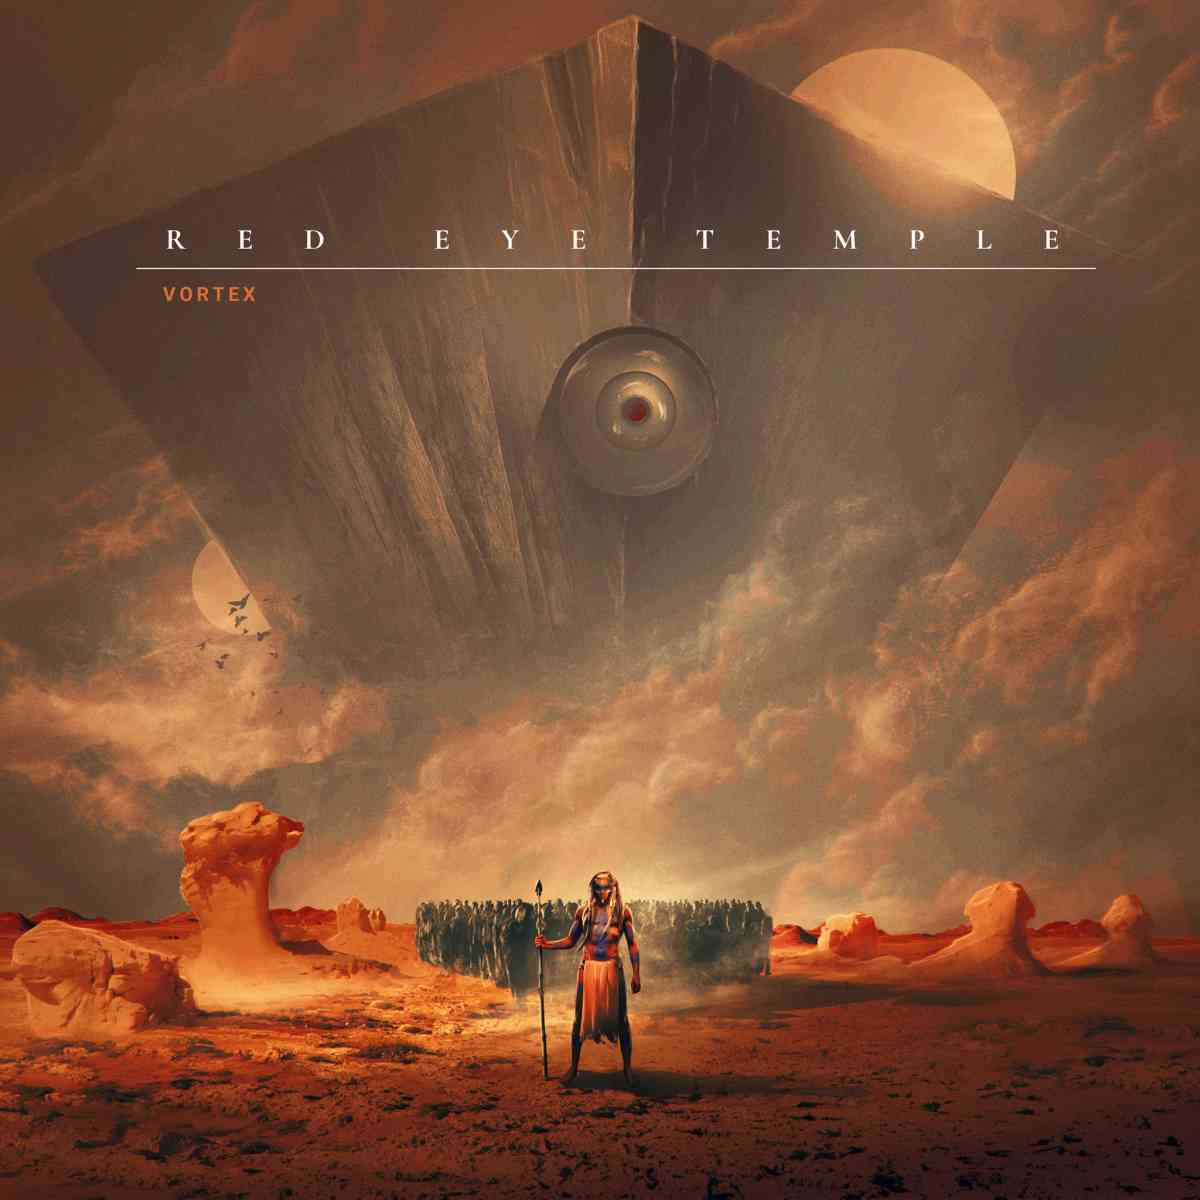 Red Eye Temple - Vortex - album cover